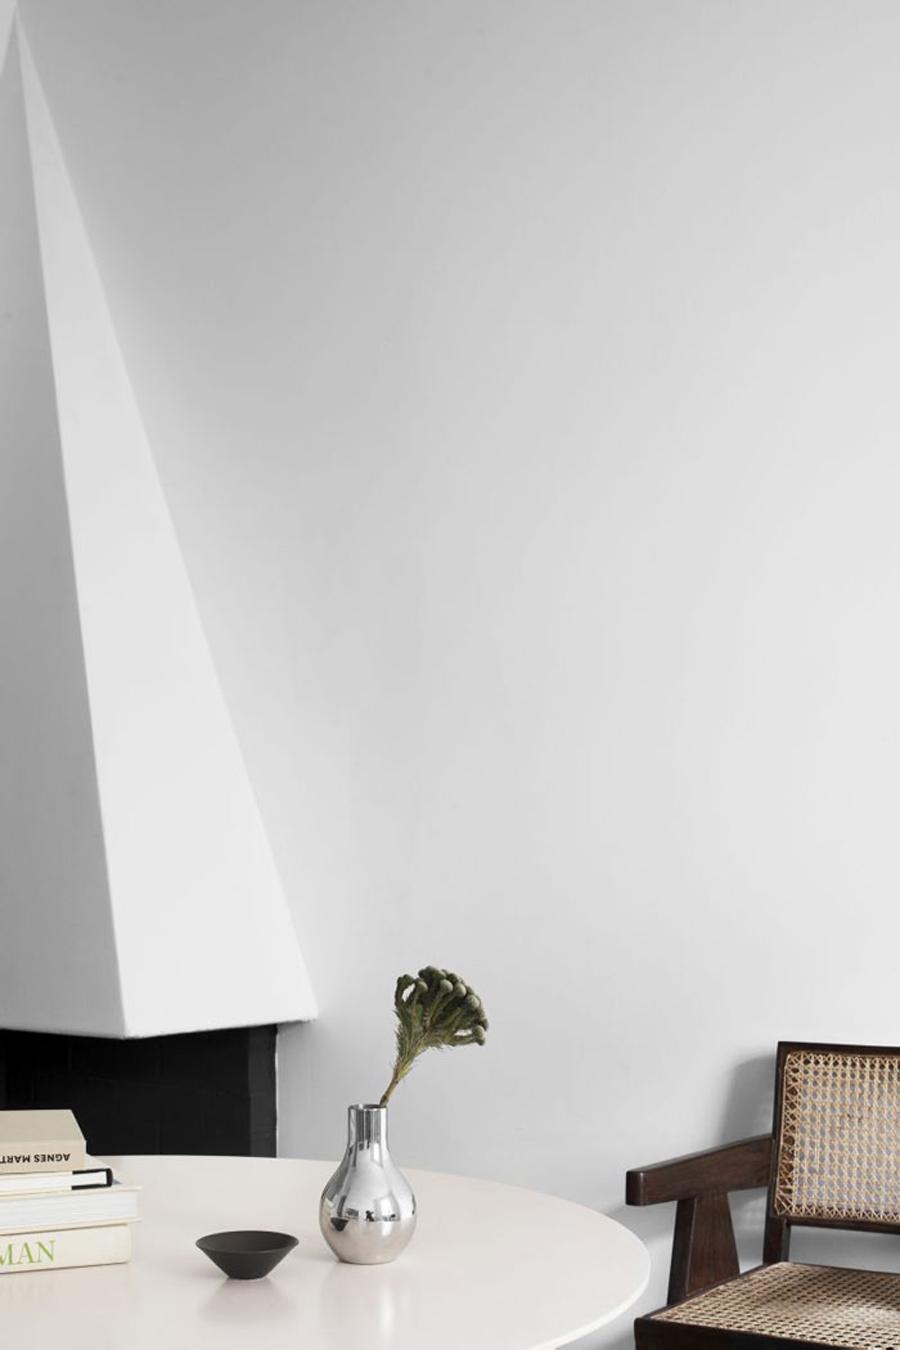 claes-juhlin-minimalism-art-home-4